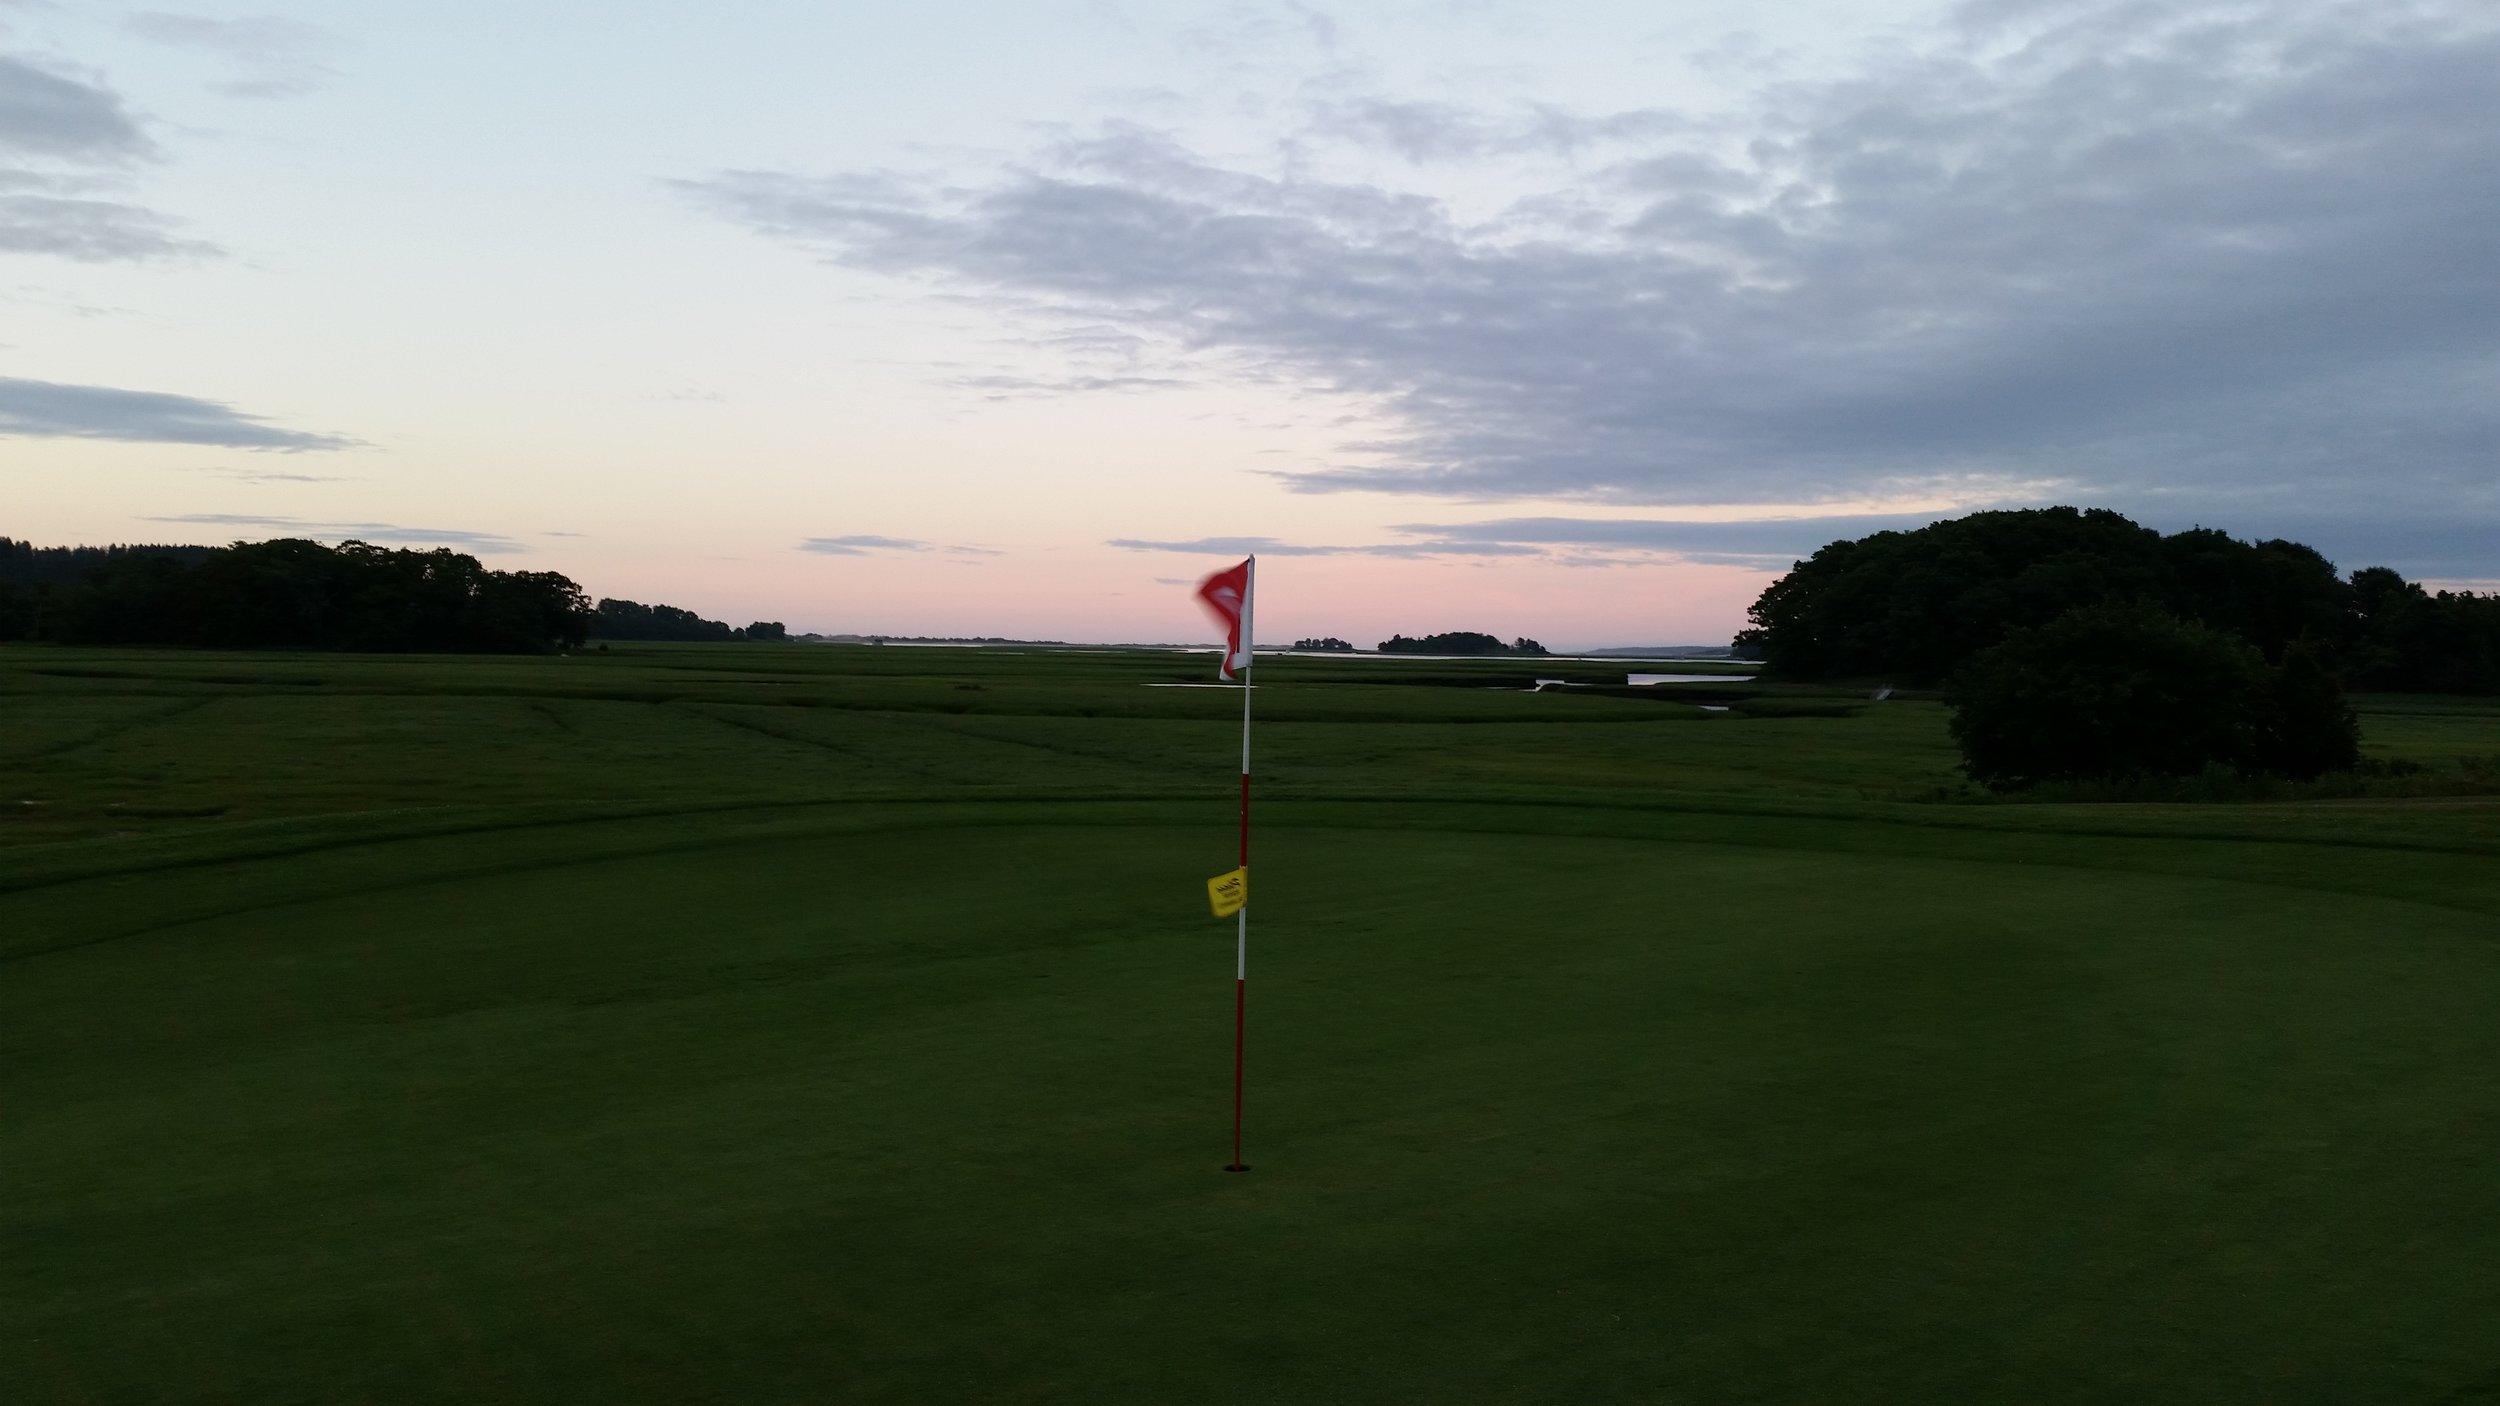 Cape Ann Golf Club, Essex, MA - 2016 Renovations to 1st Hole